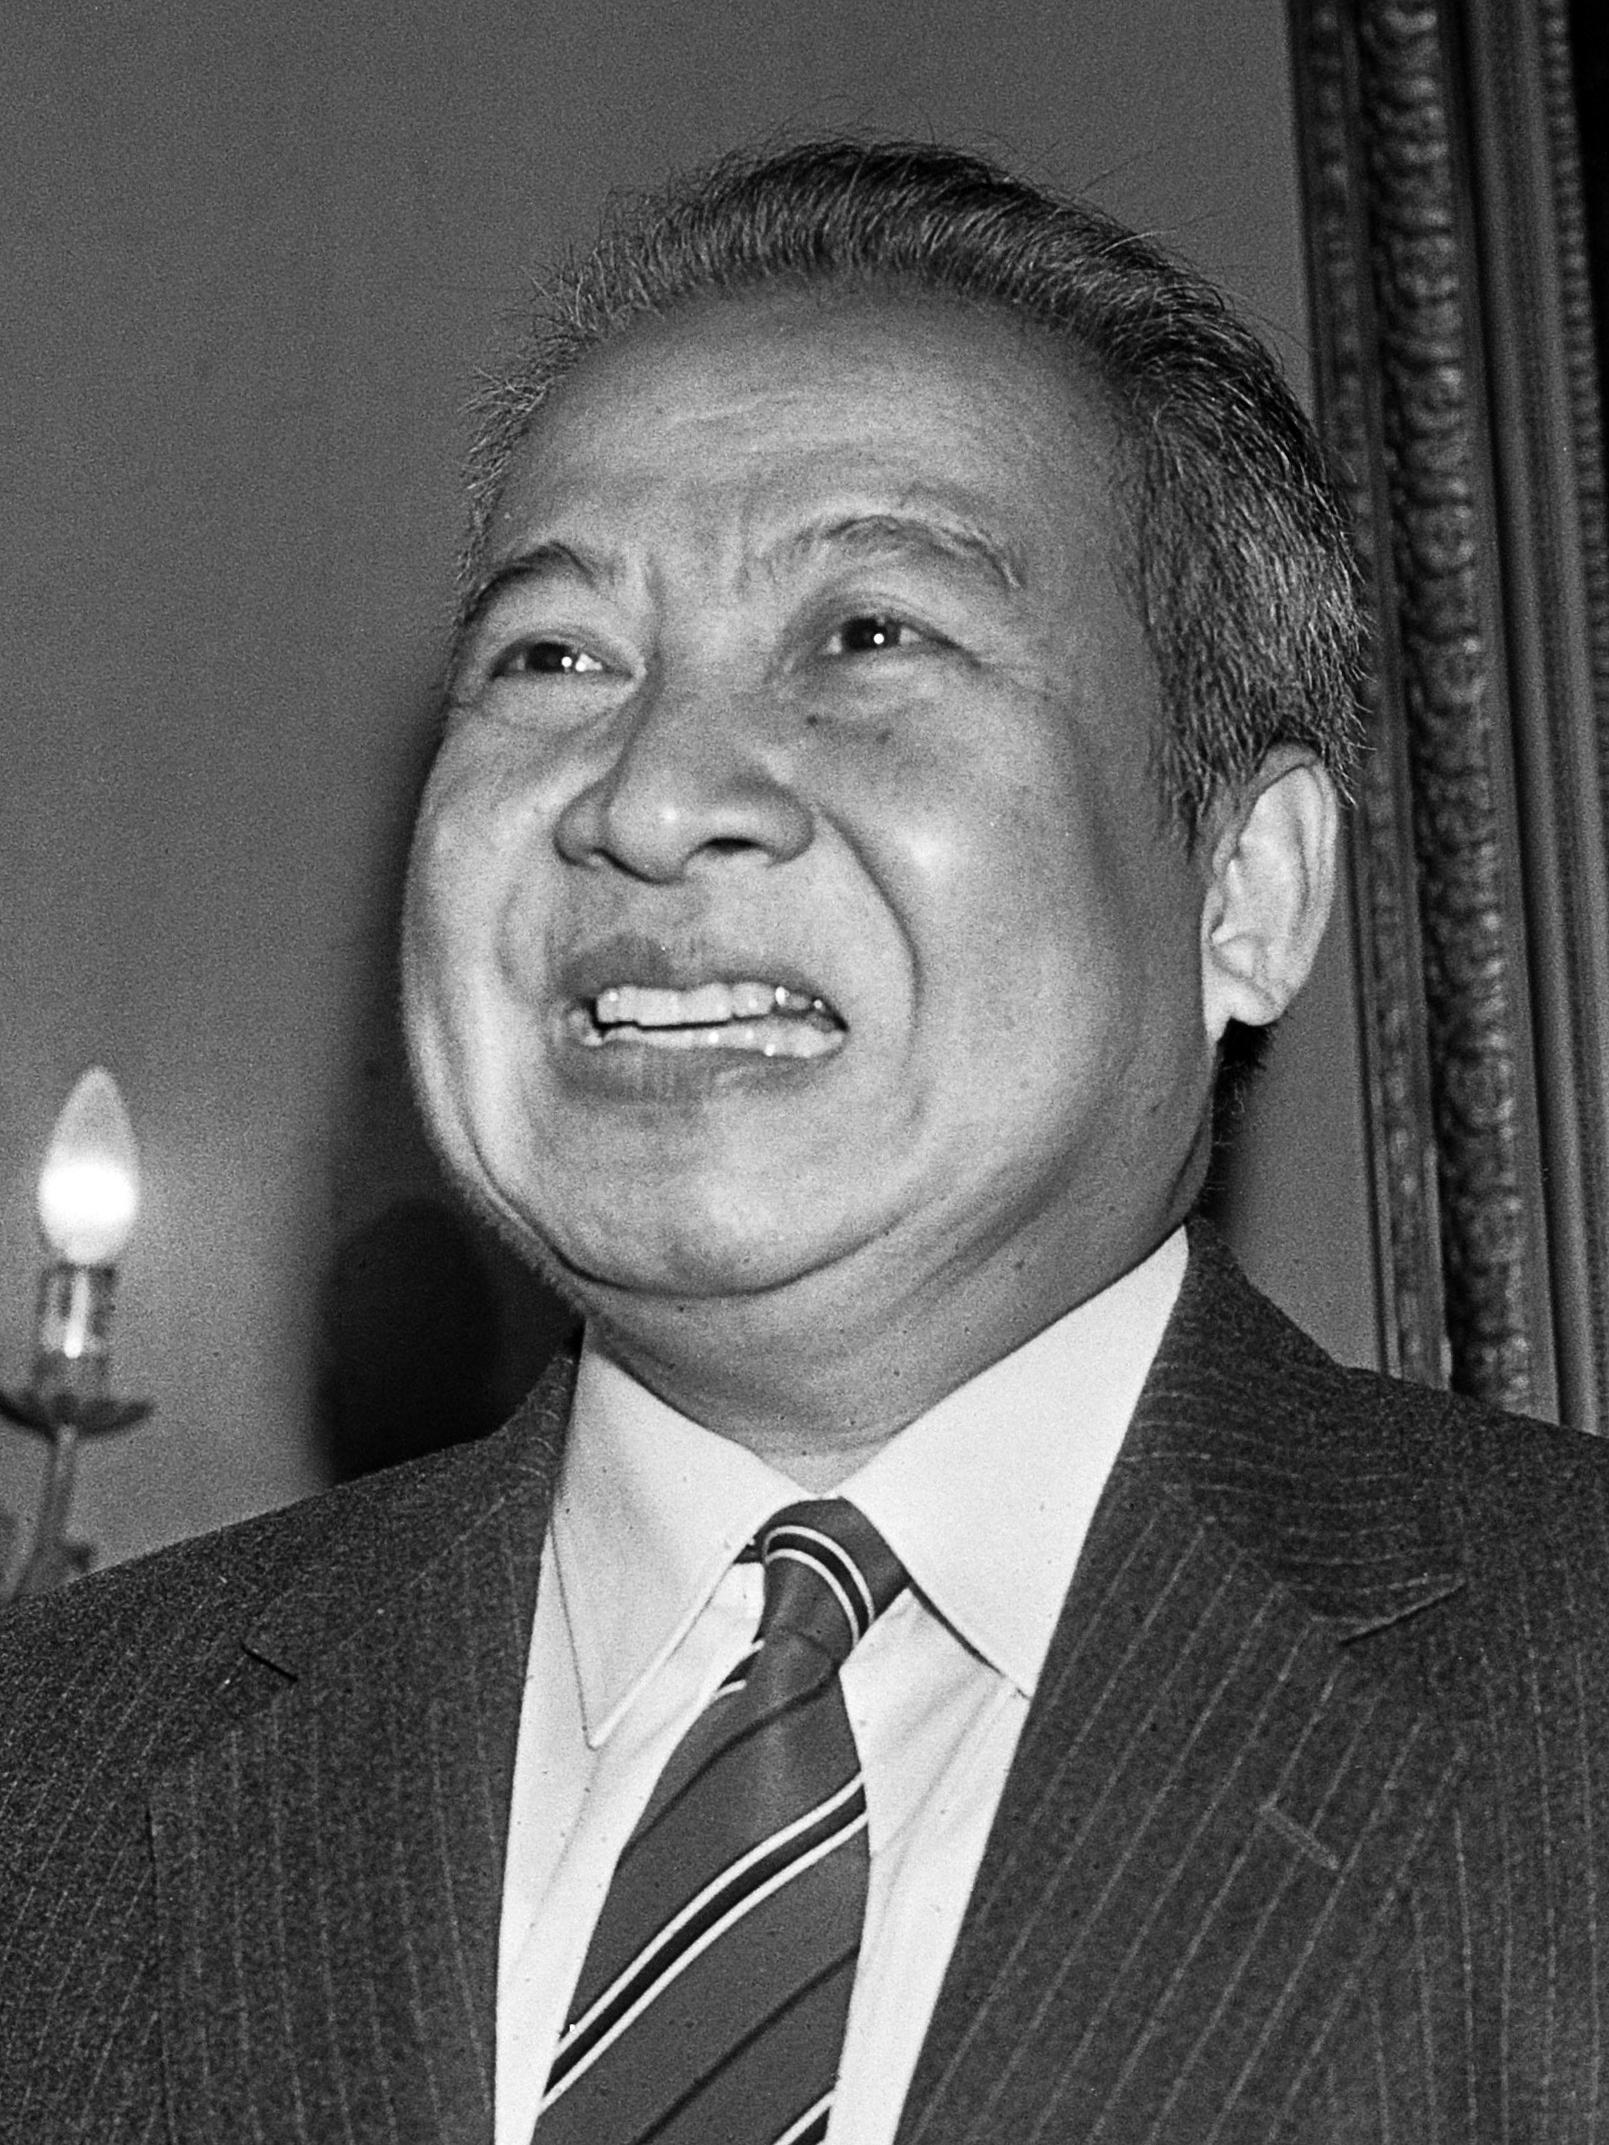 Norodom Sihanouk biography part 2